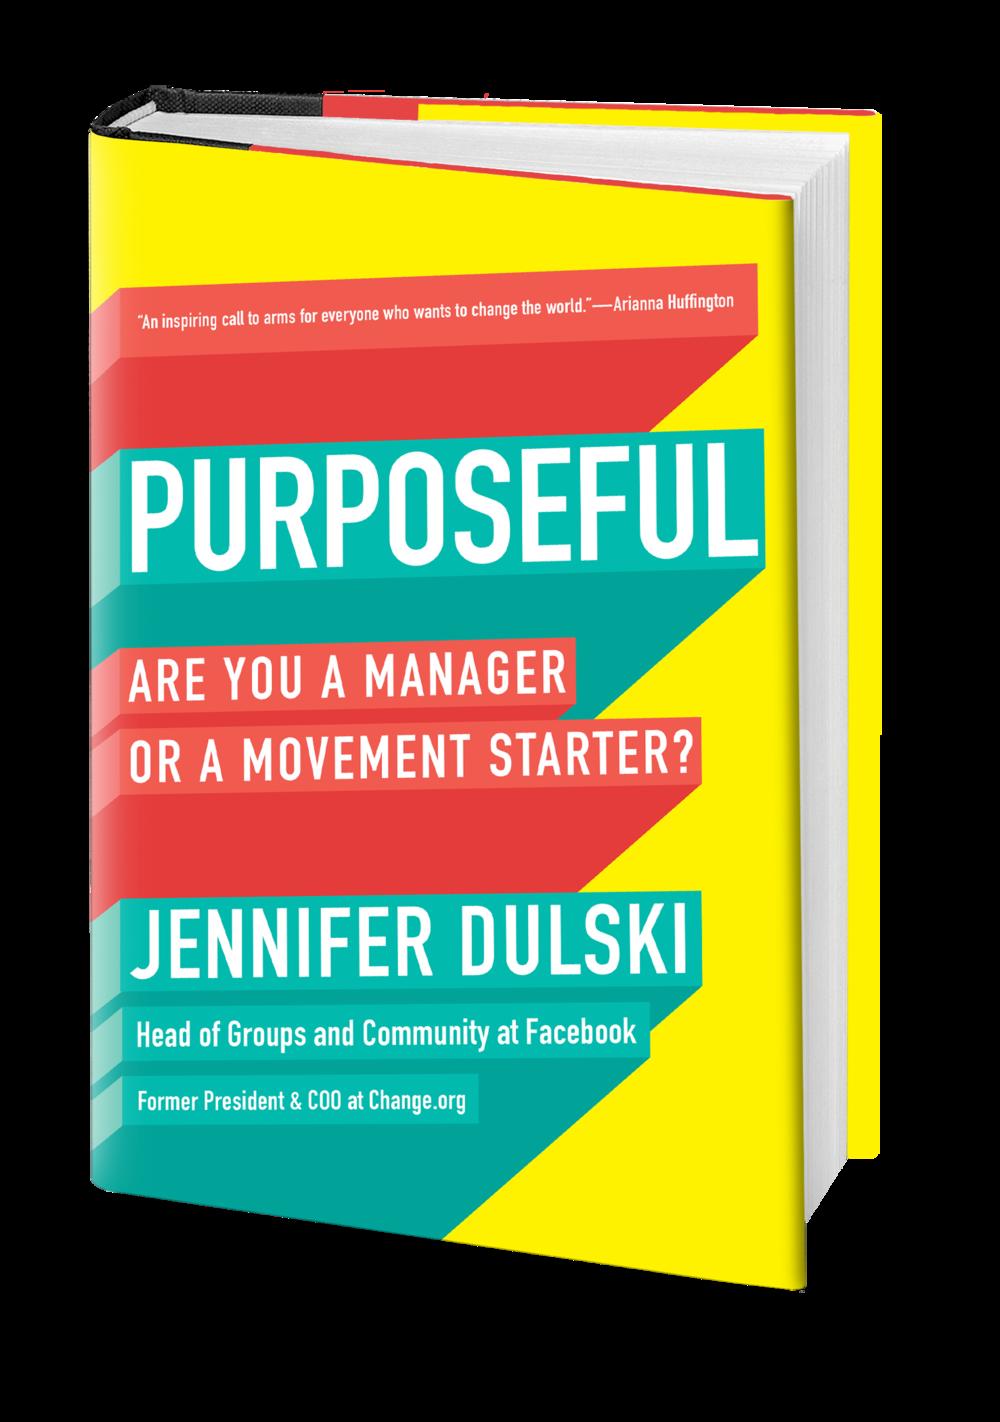 Purposeful_3D_new.png